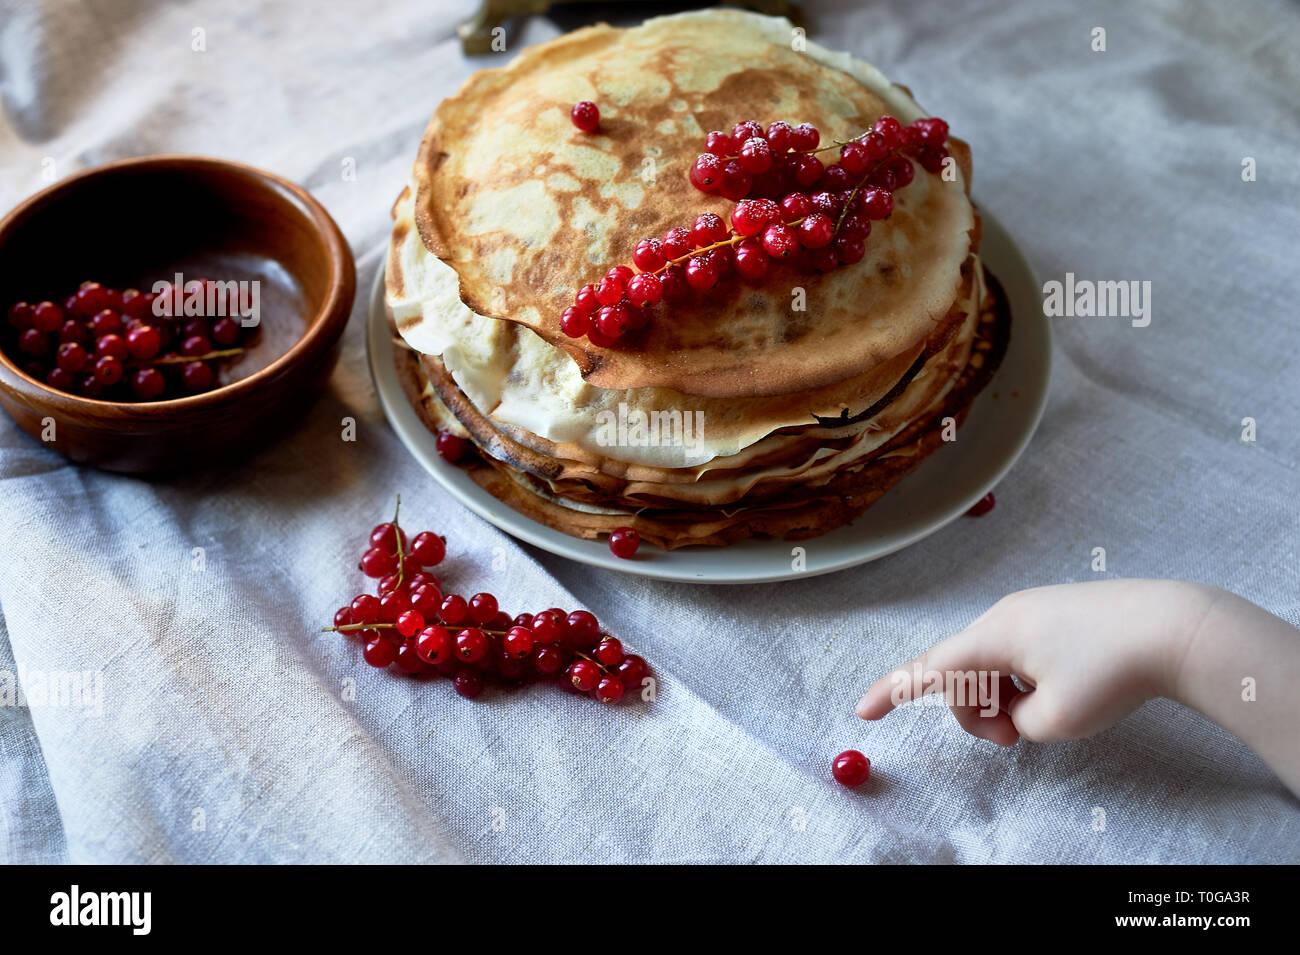 Stapel Pfannkuchen mit roten saftigen Johannisbeeren. Stockbild